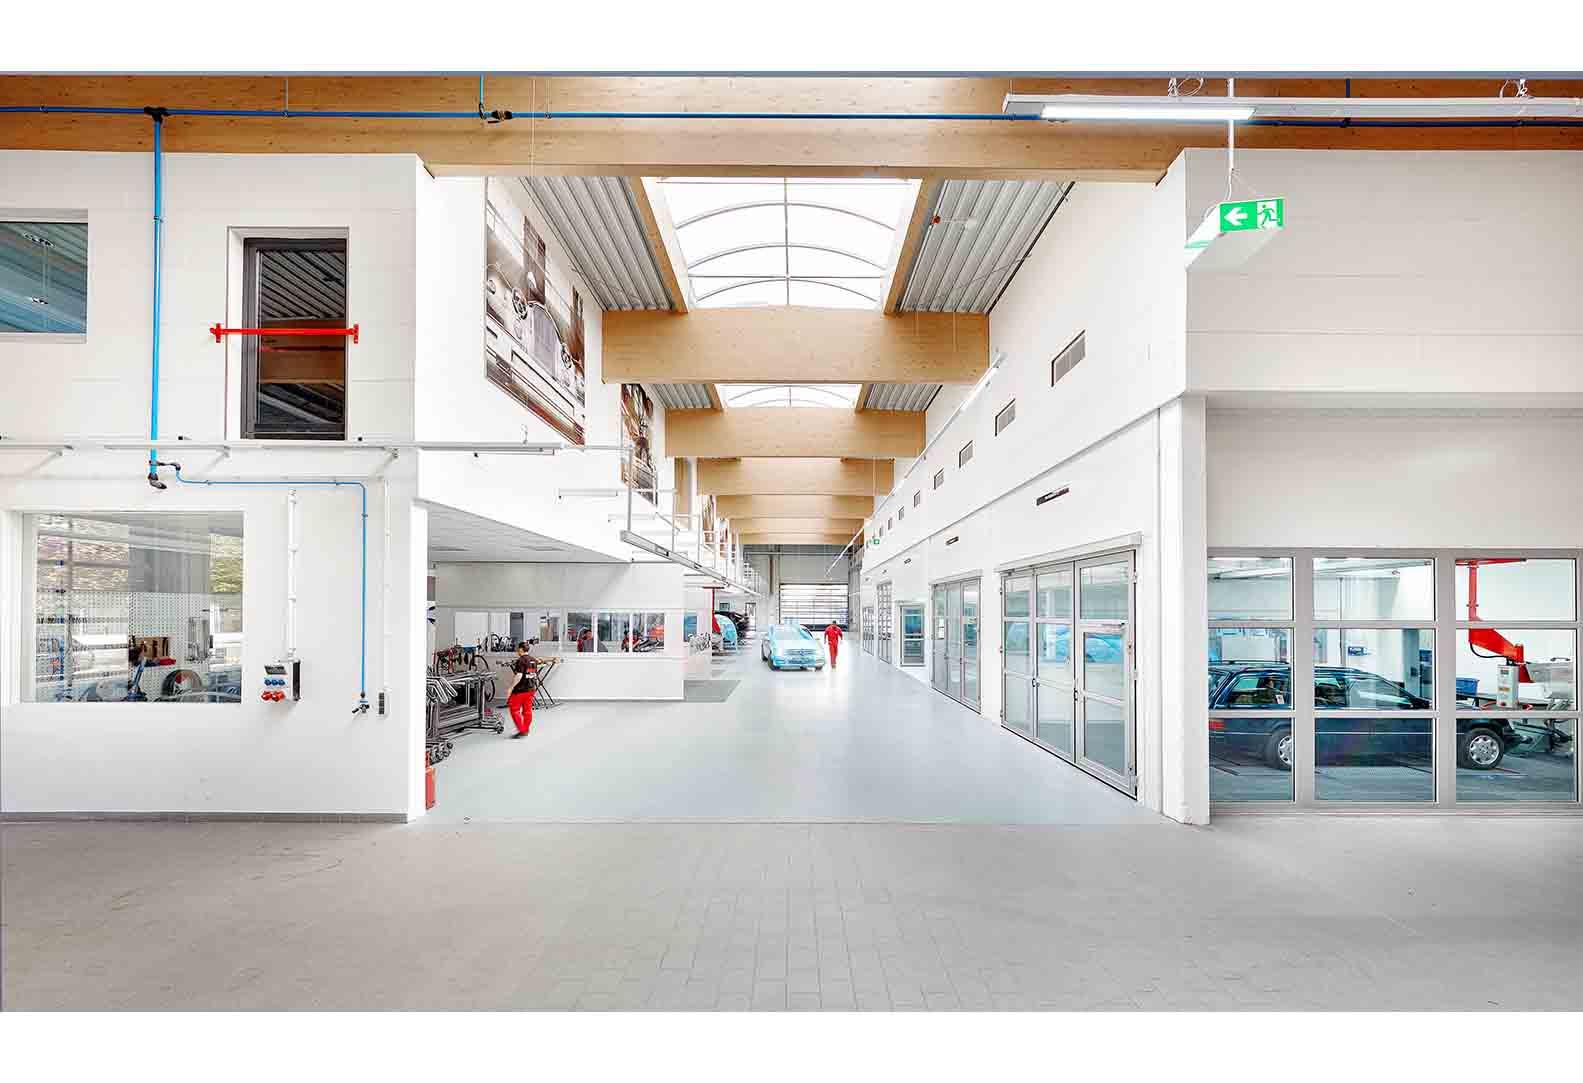 Neubau Lackiererei und Karosseriewerkstatt - Fellbach